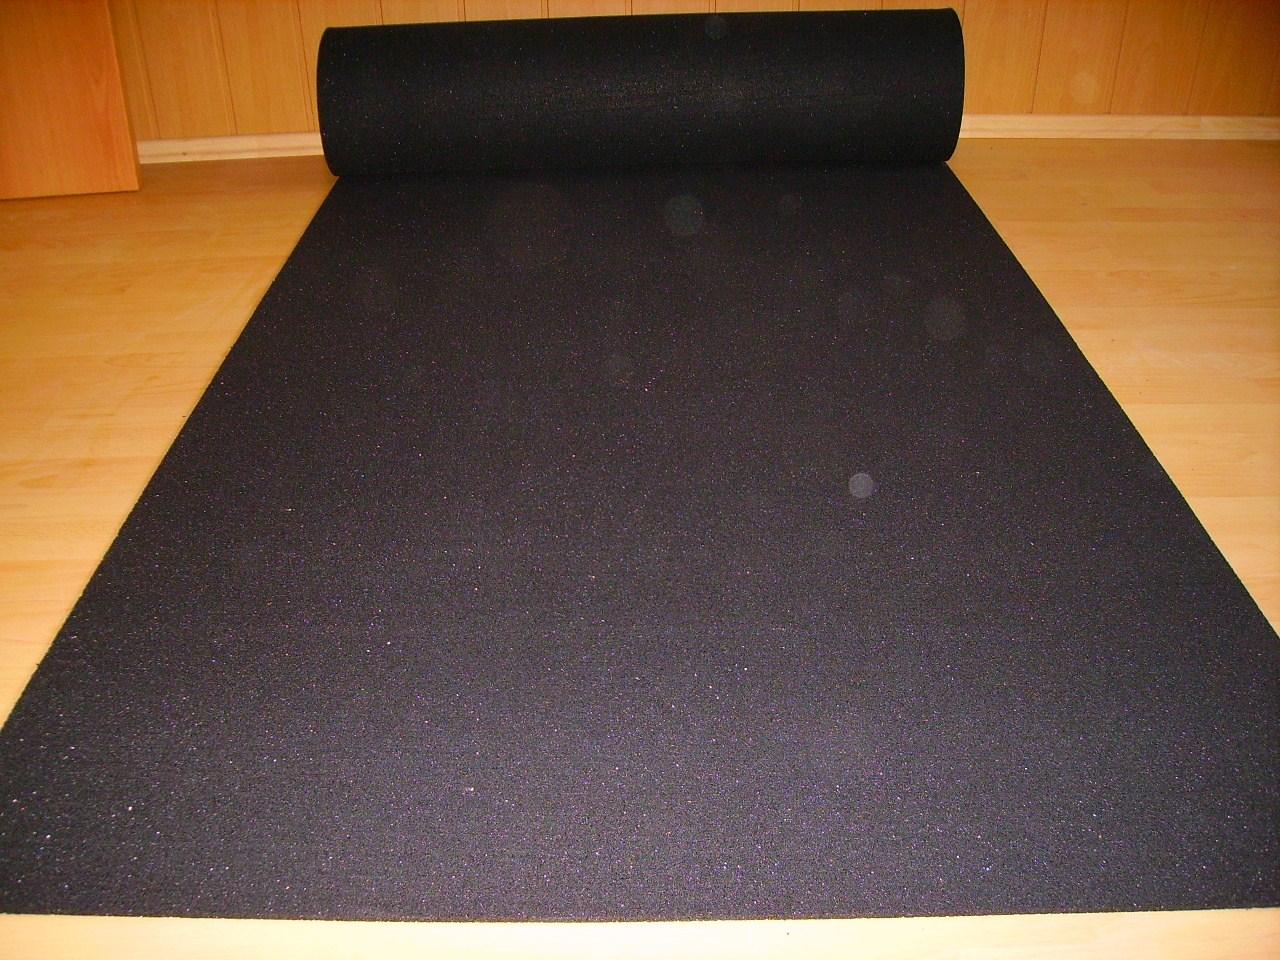 bautenschutzmatte 6 mm rgs shop. Black Bedroom Furniture Sets. Home Design Ideas